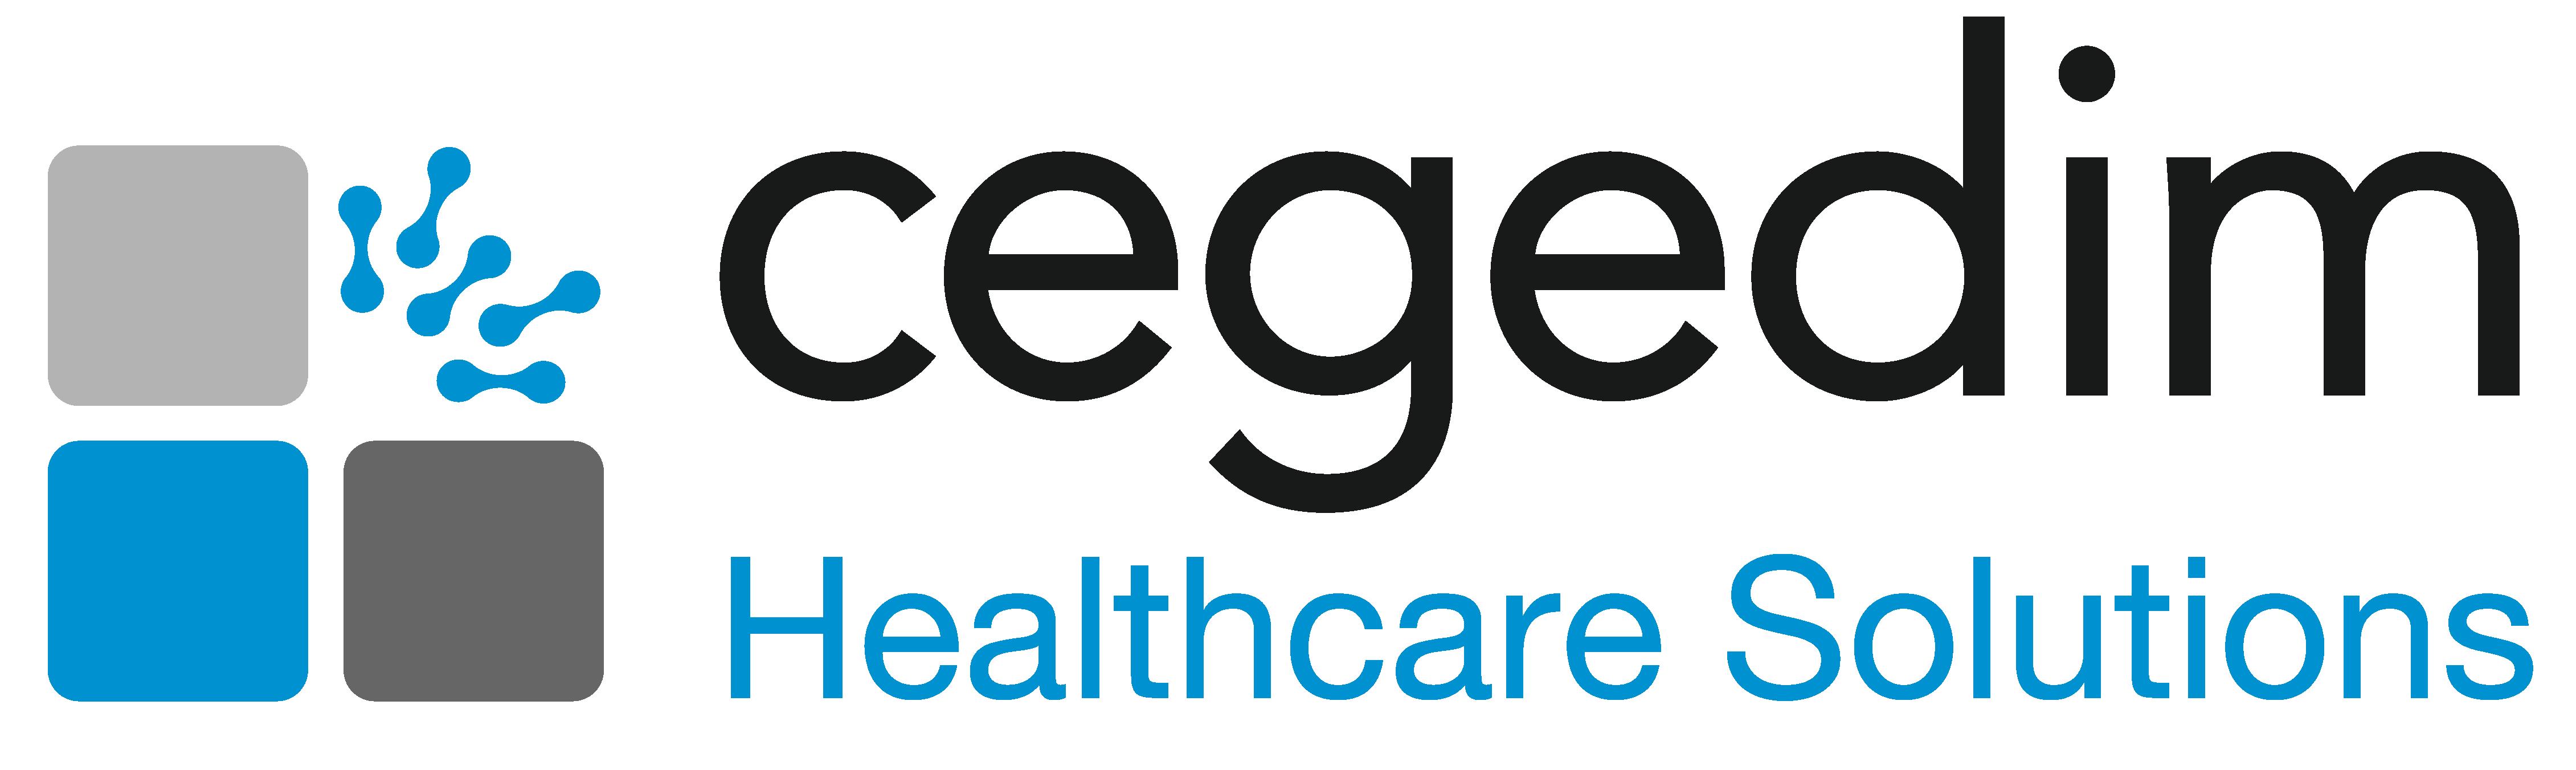 Cegedim Healthcare Solutions Logo